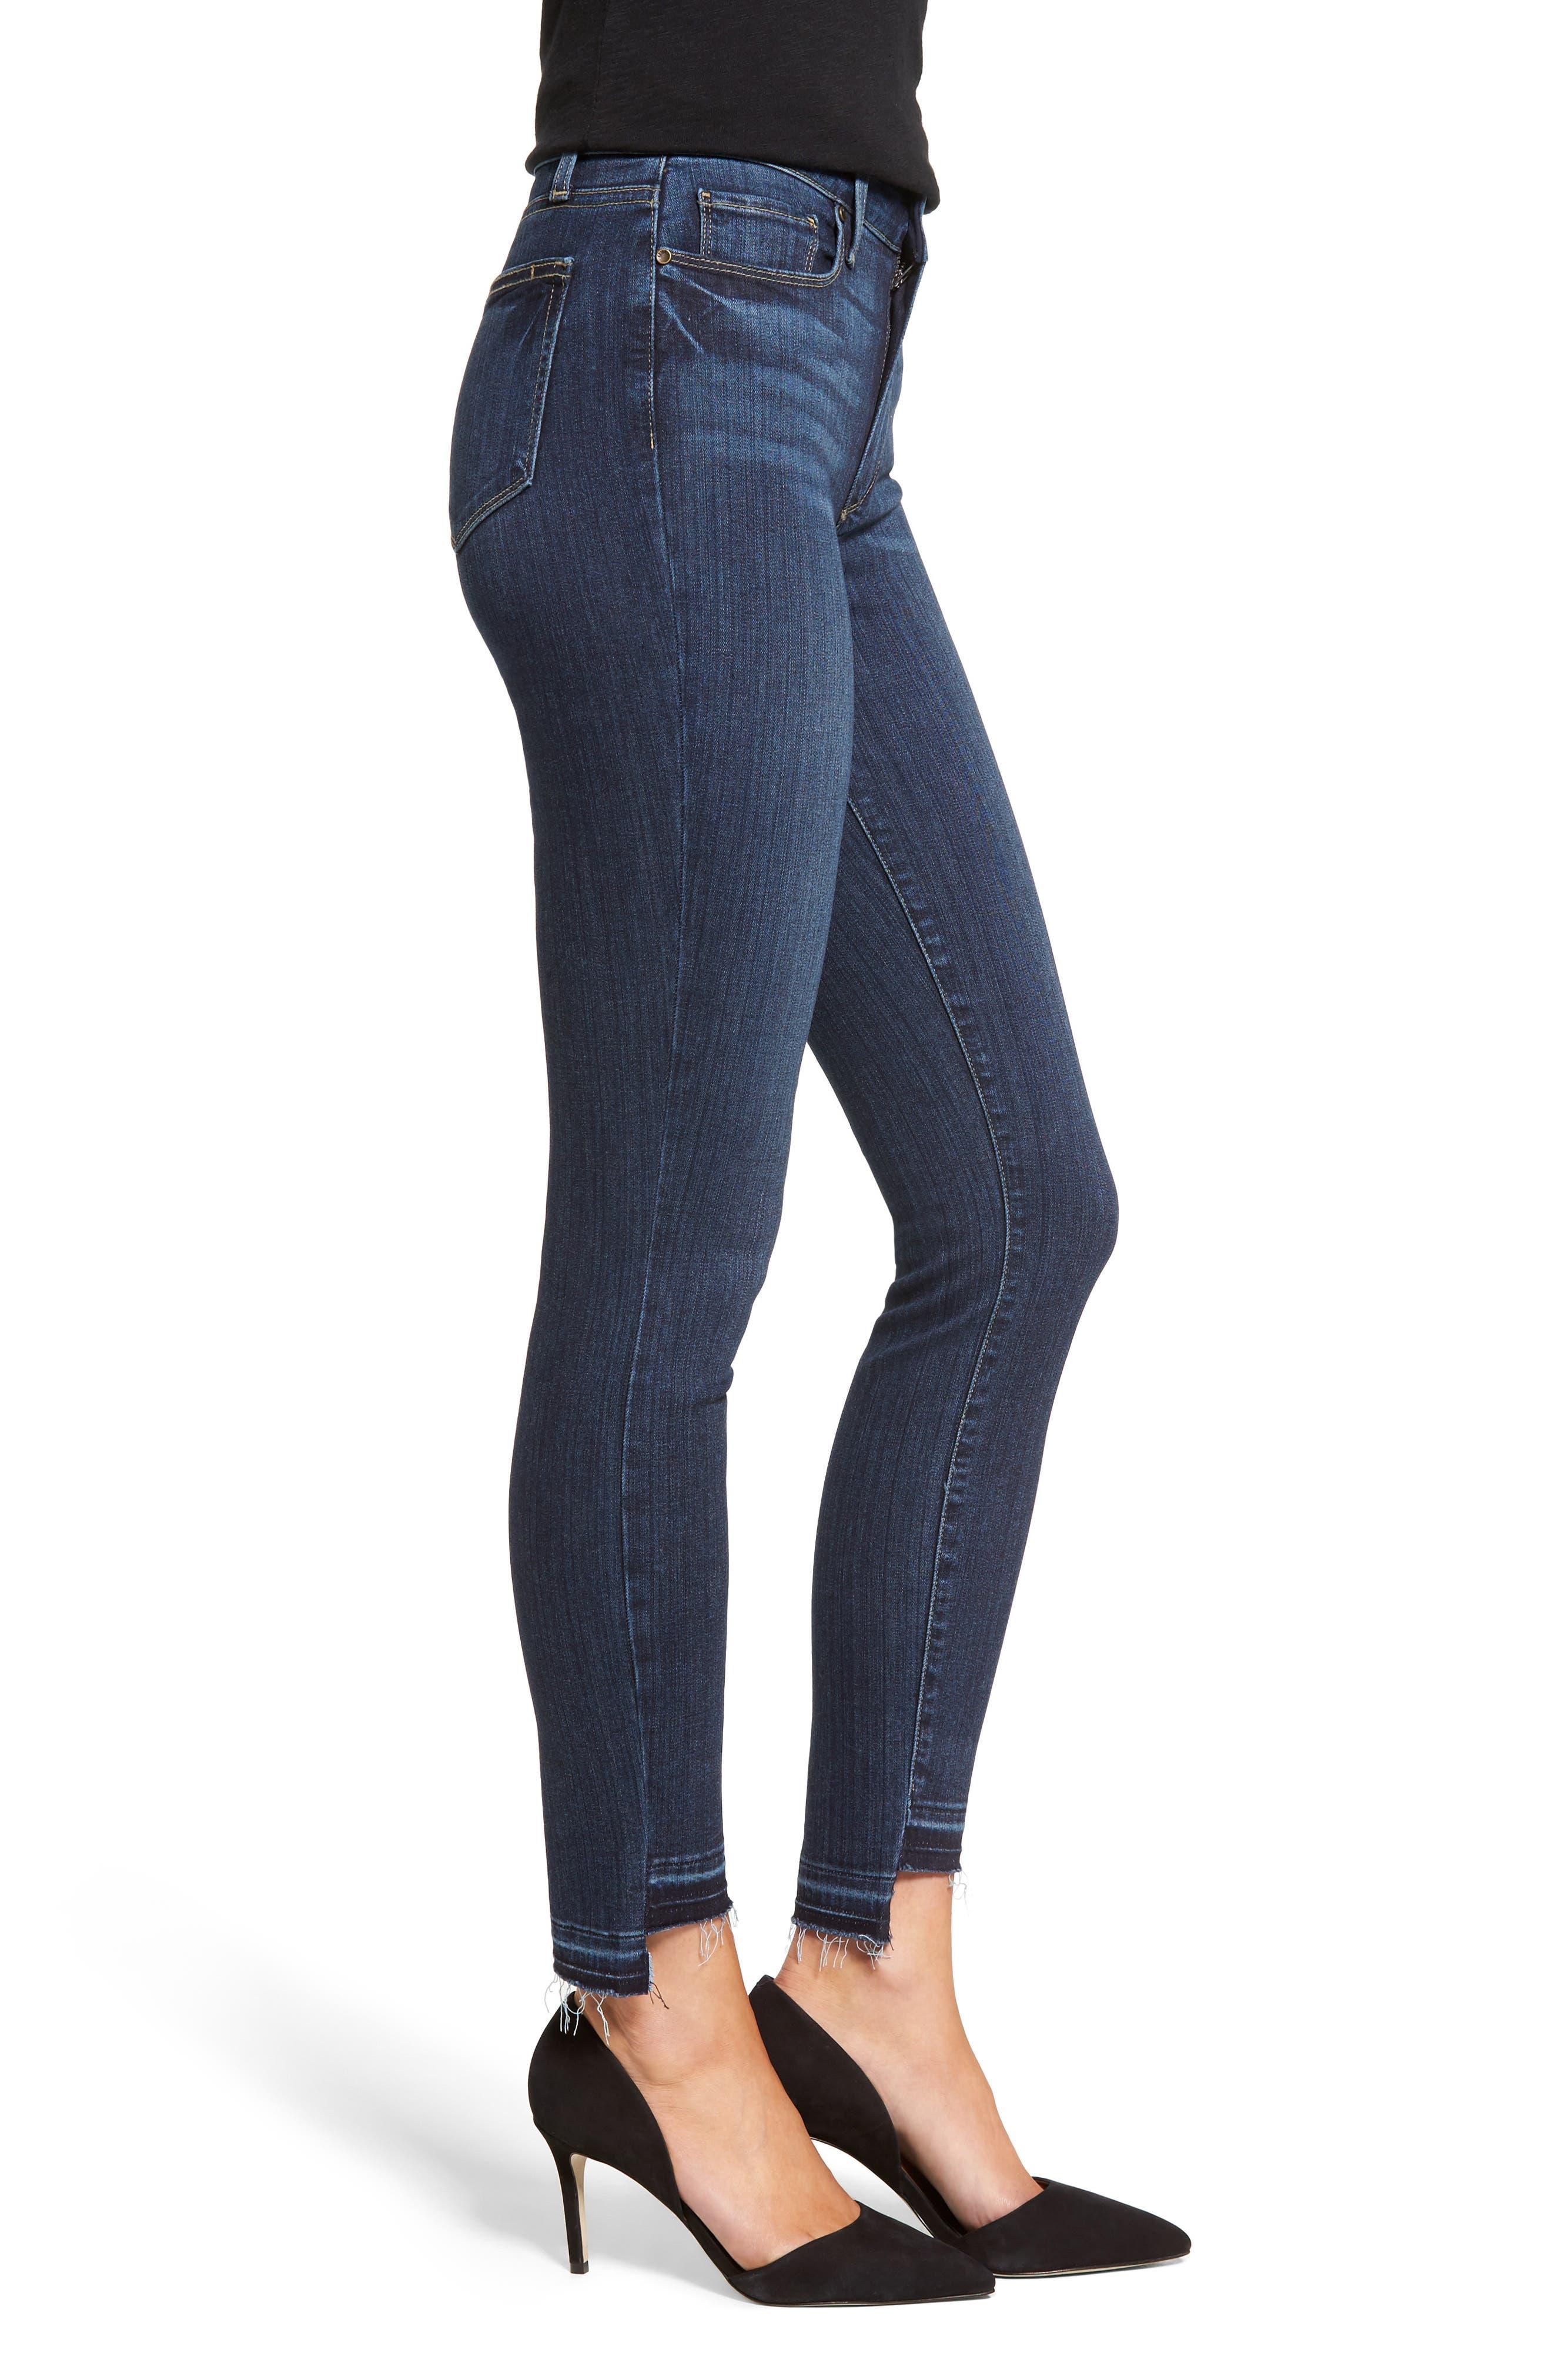 Hoxton High Waist Skinny Jeans,                             Alternate thumbnail 3, color,                             400